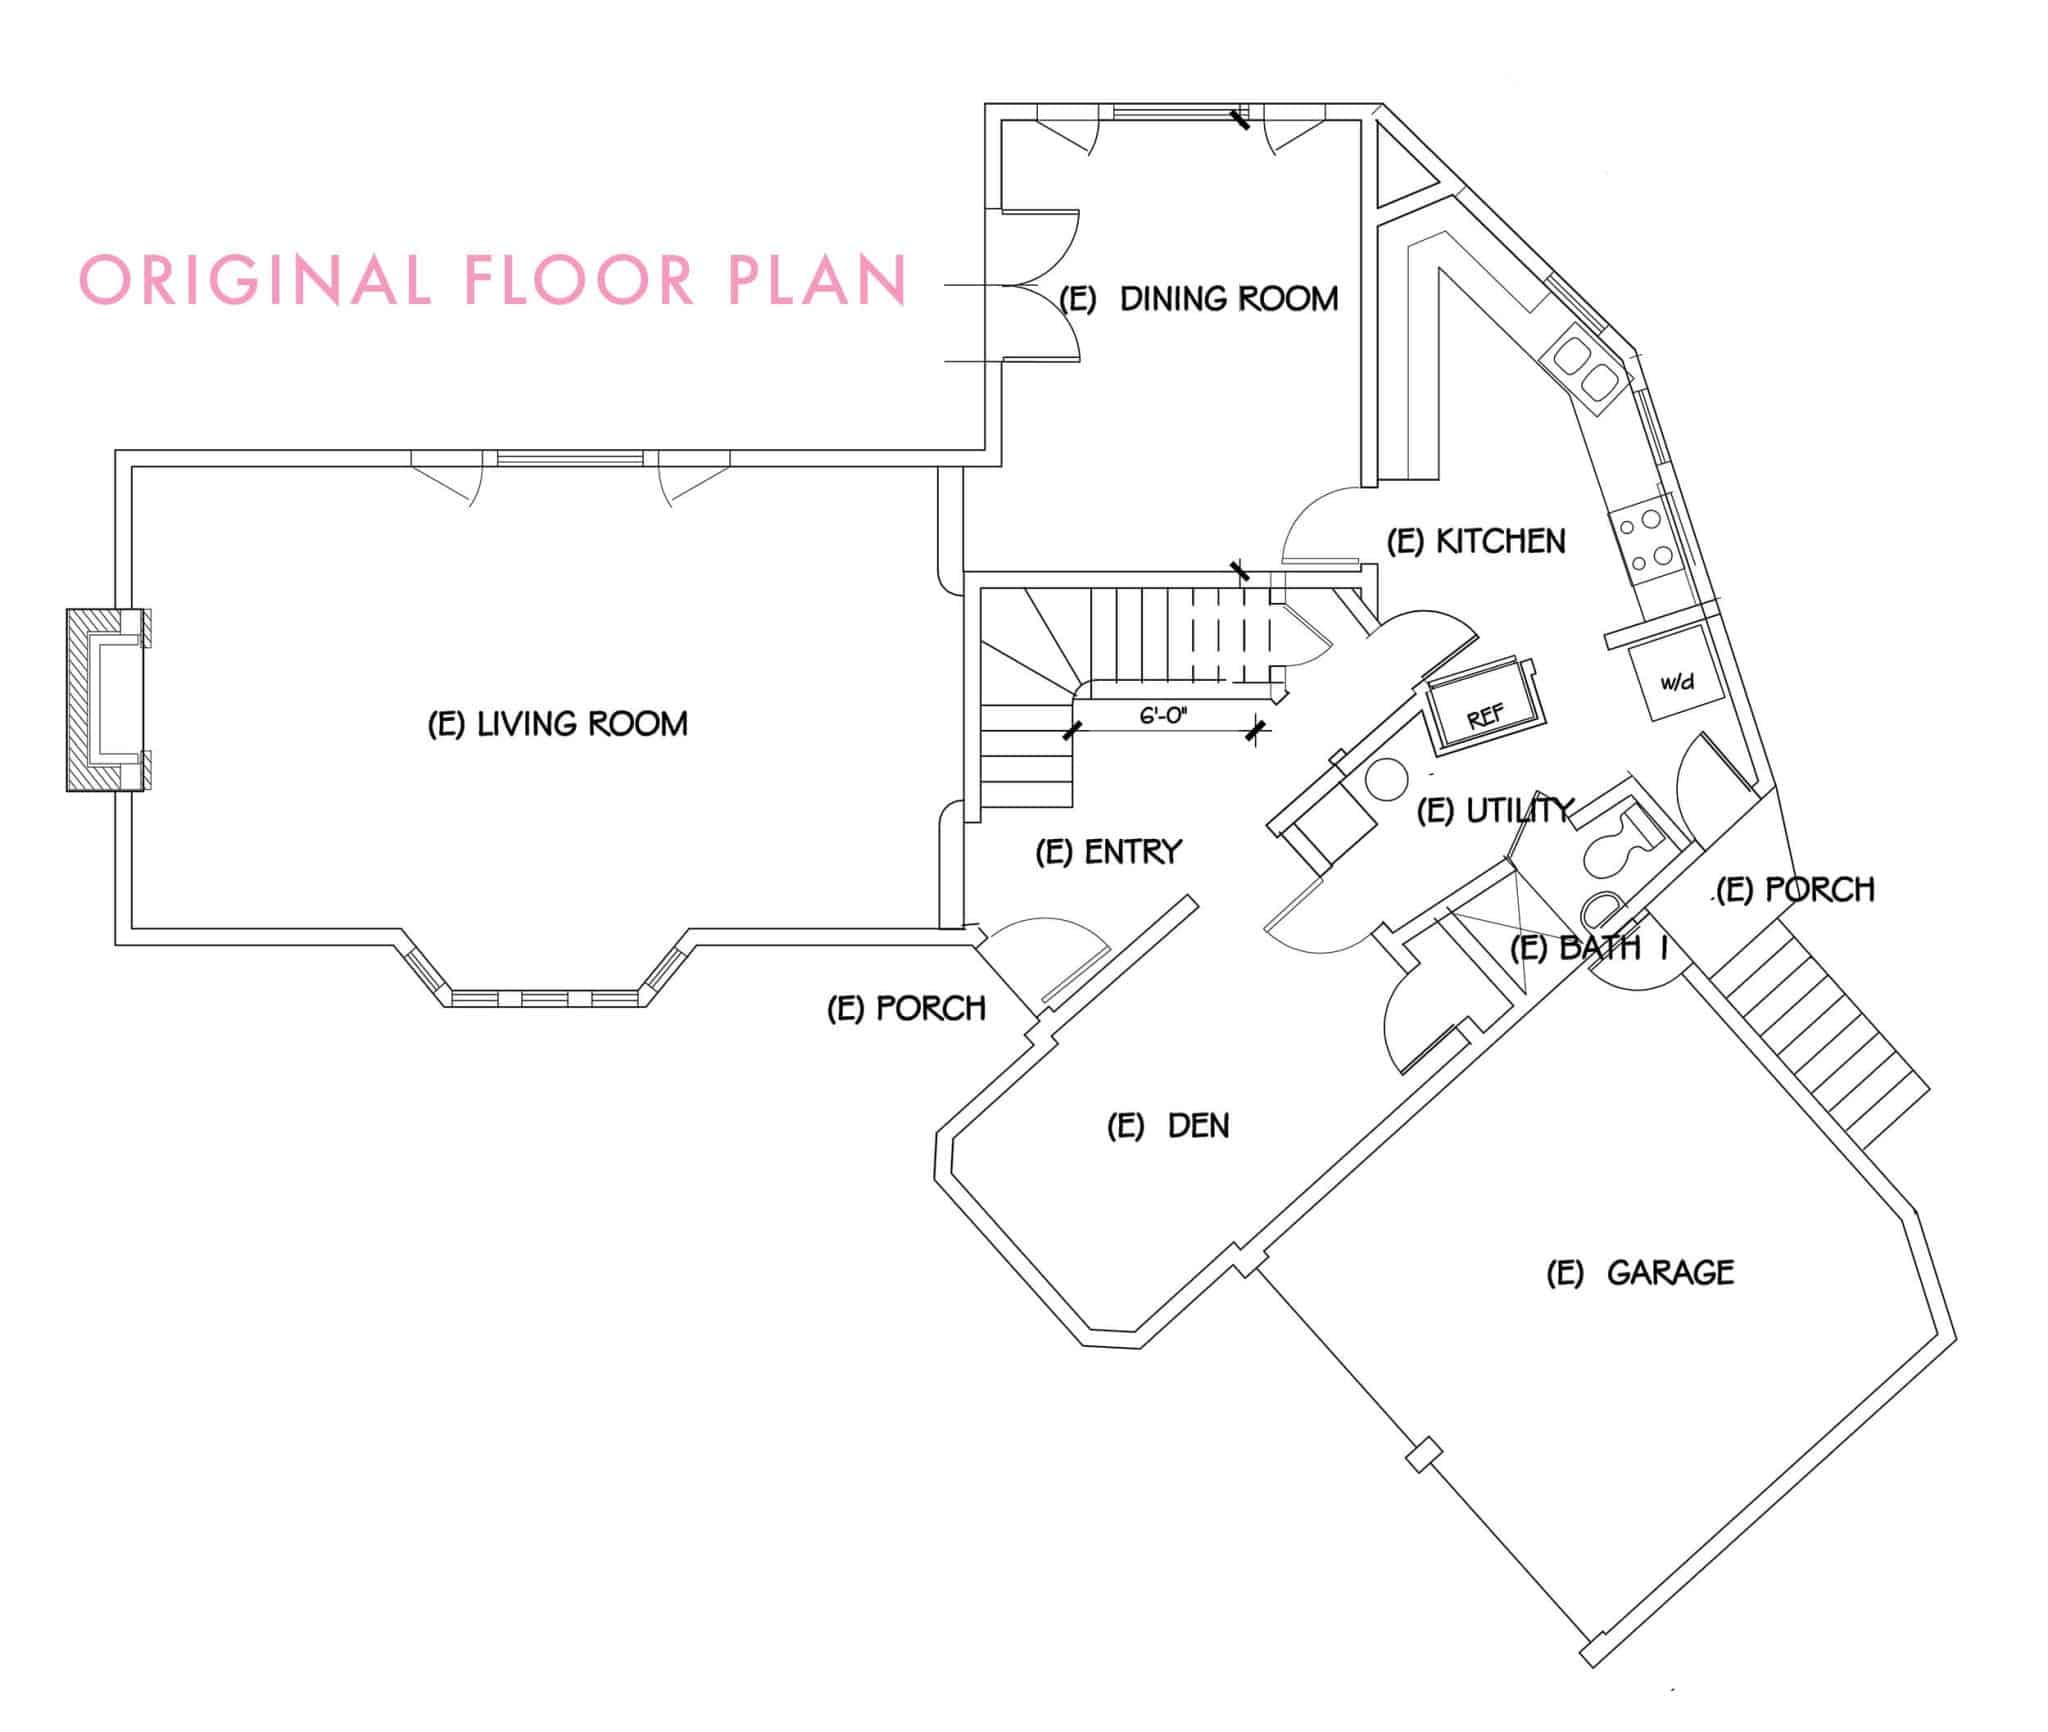 original_floor-plan_revised-floor-plan_before_with-text-overlay